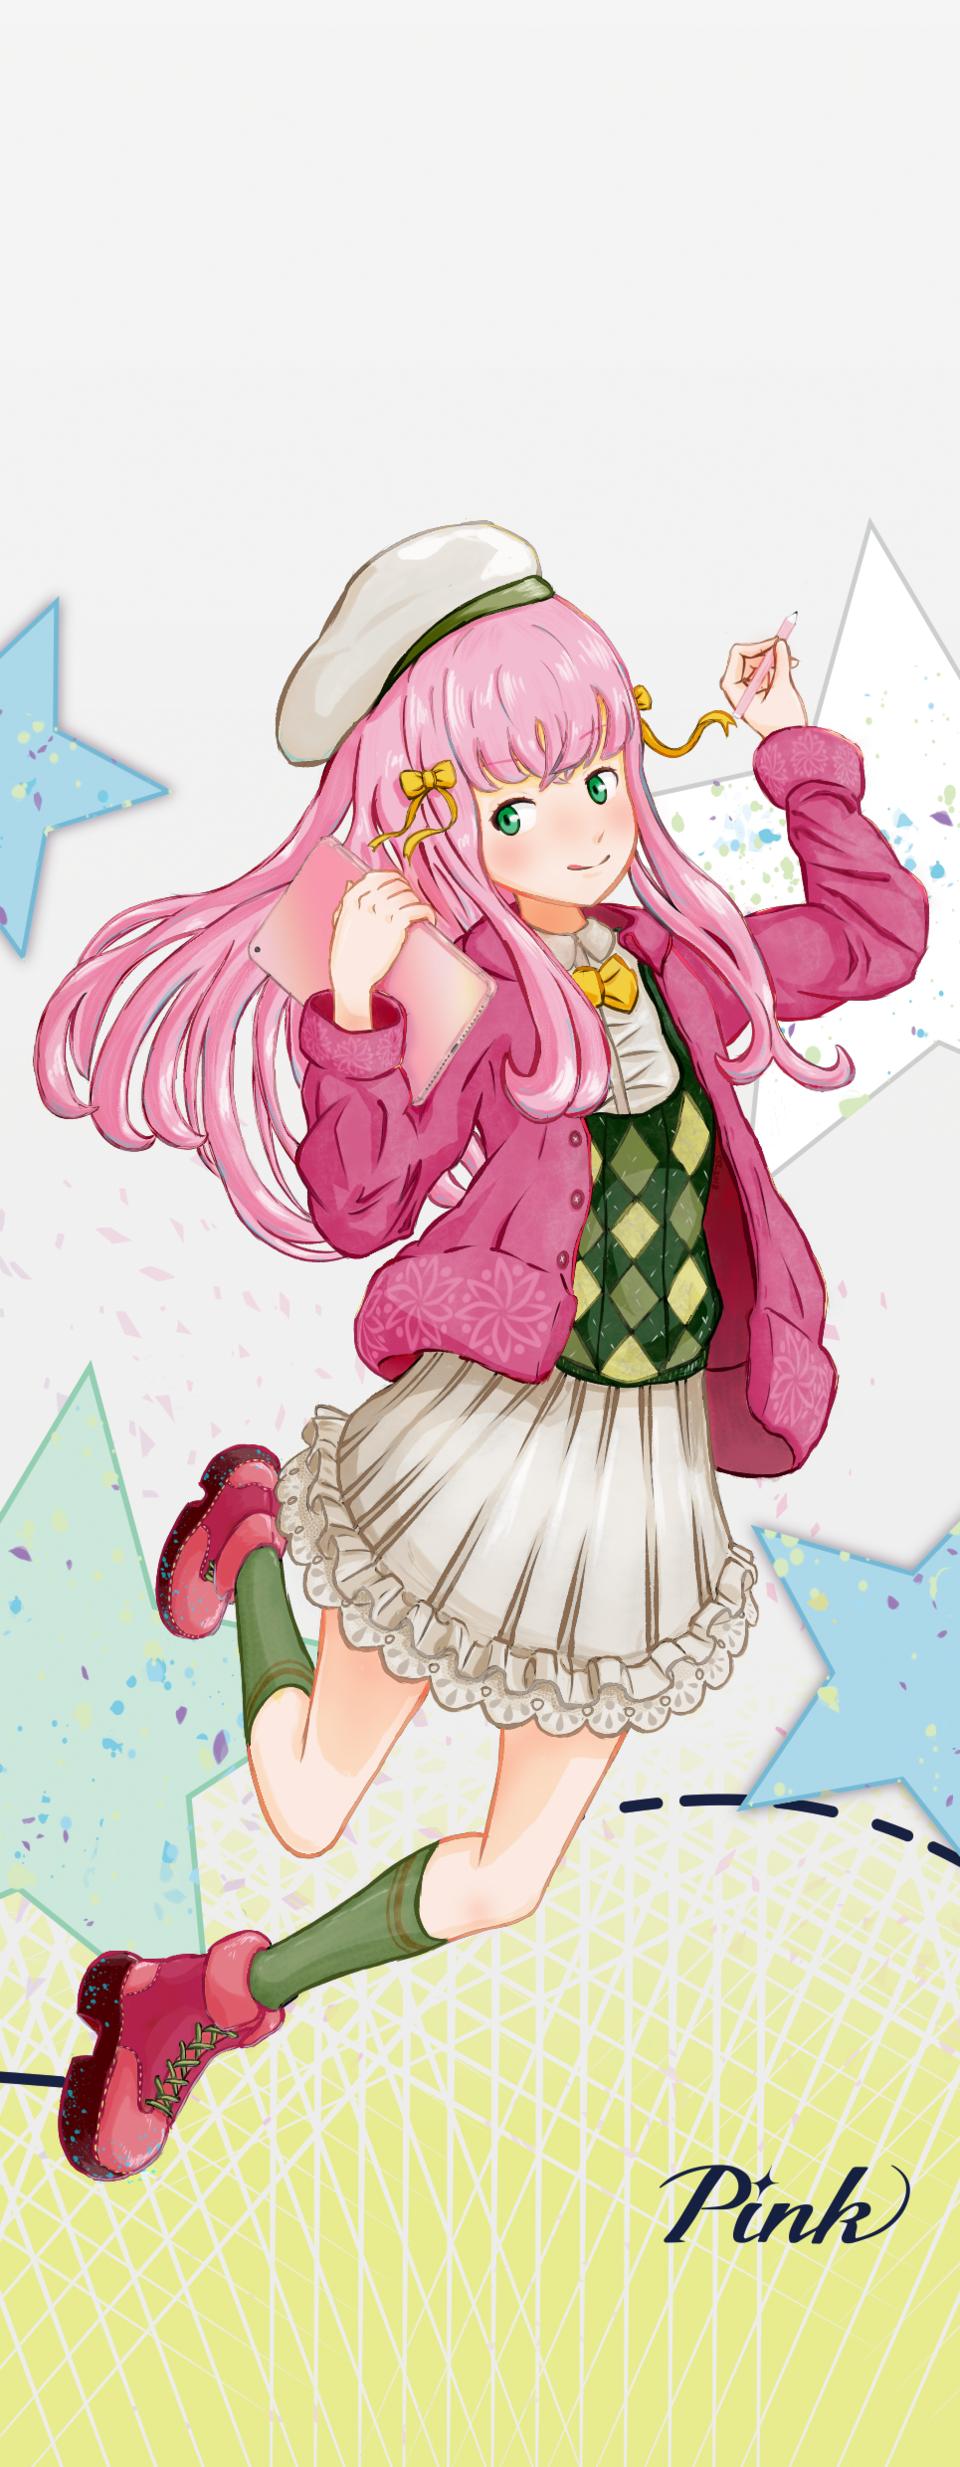 PASTEL SKETCH PINK Illust of 雲野浮游